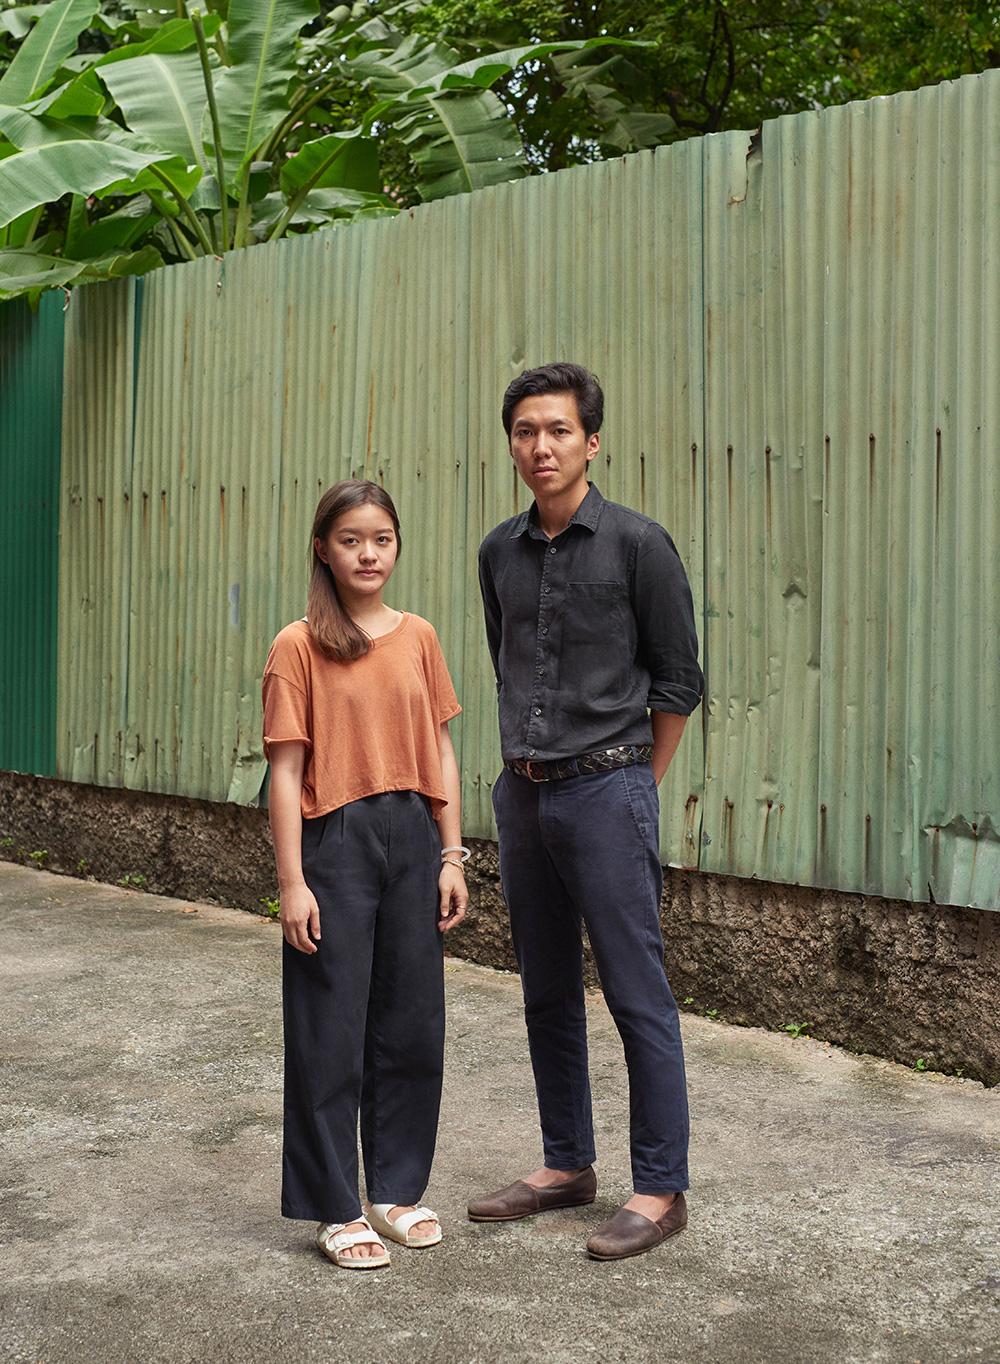 17.08.14-18_WALLPAPER_THAILAND_003_029